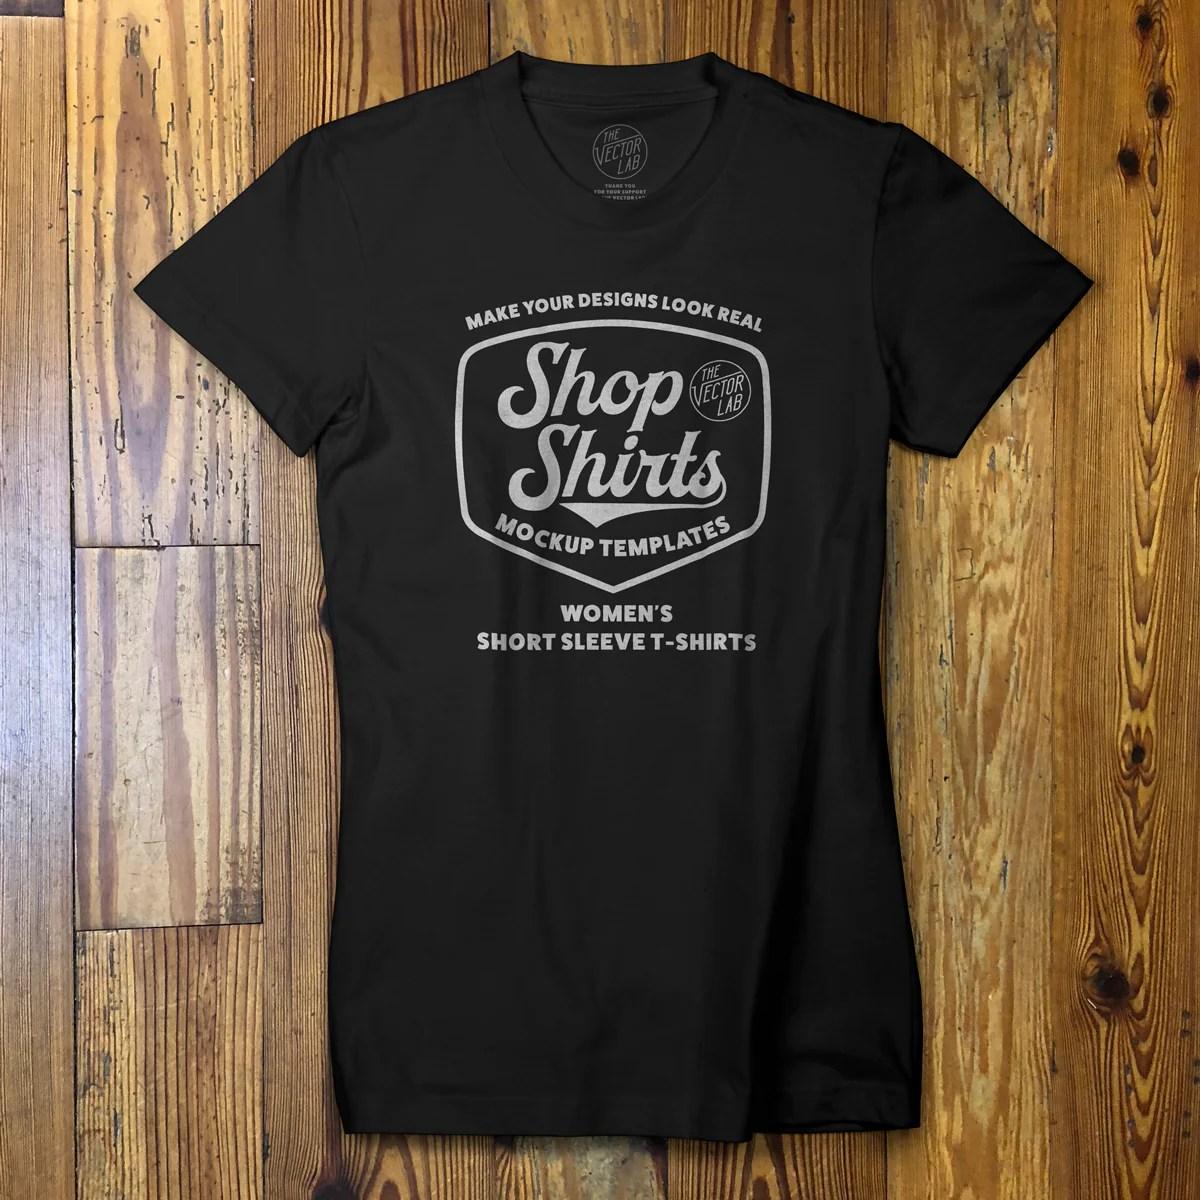 Shop Shirts: Women's T-Shirt Mockup Templates - TheVectorLab